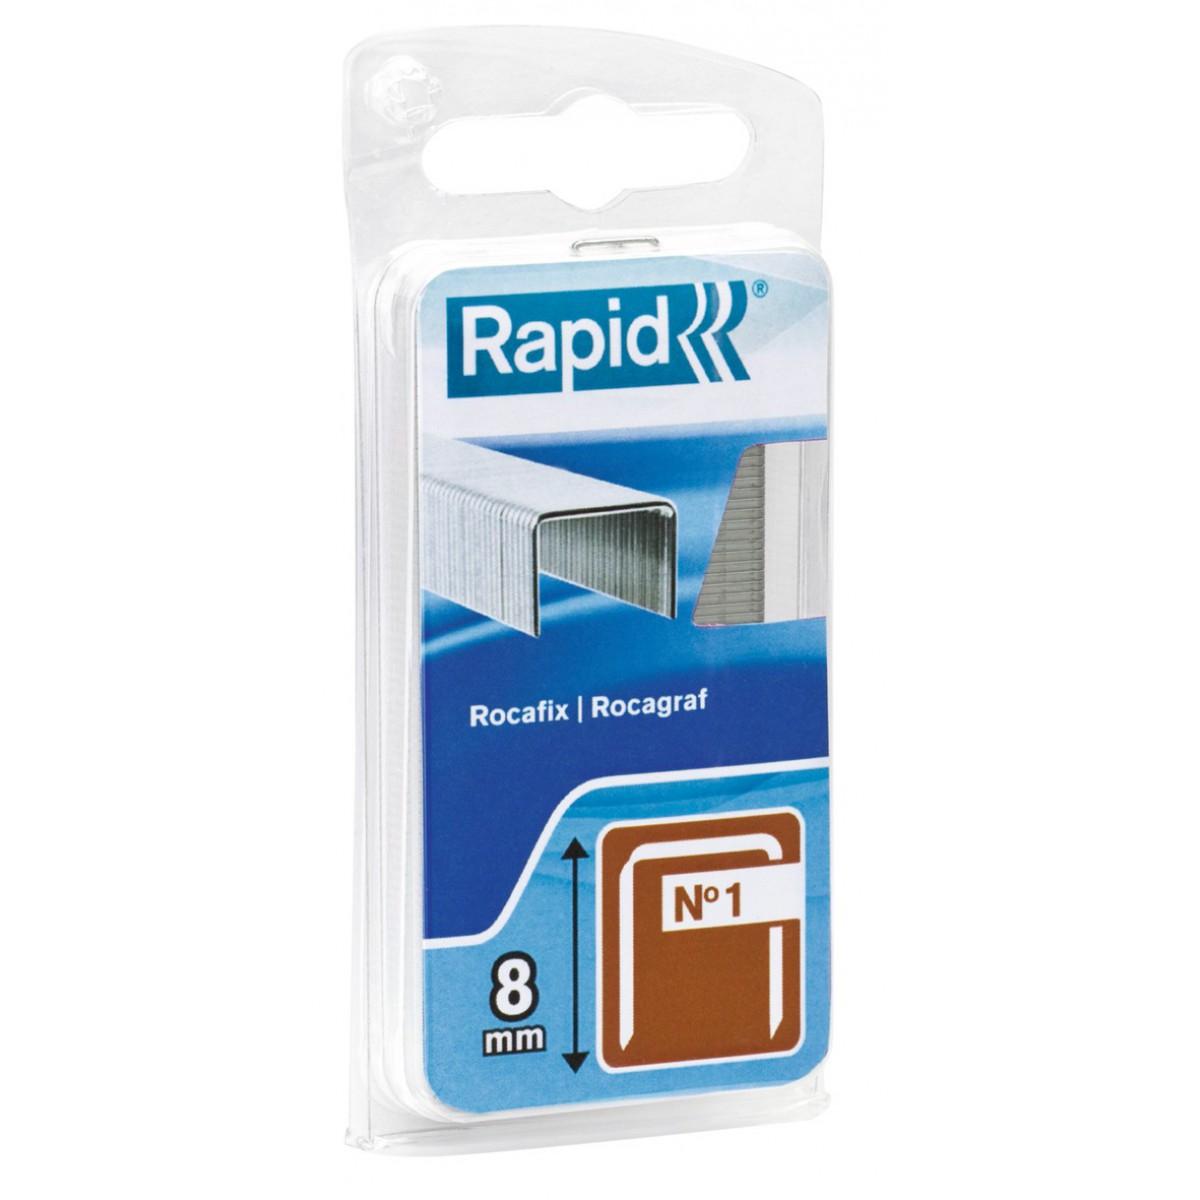 Agrafe n°1 Rapid Agraf - Hauteur 8 mm - 860 agrafes